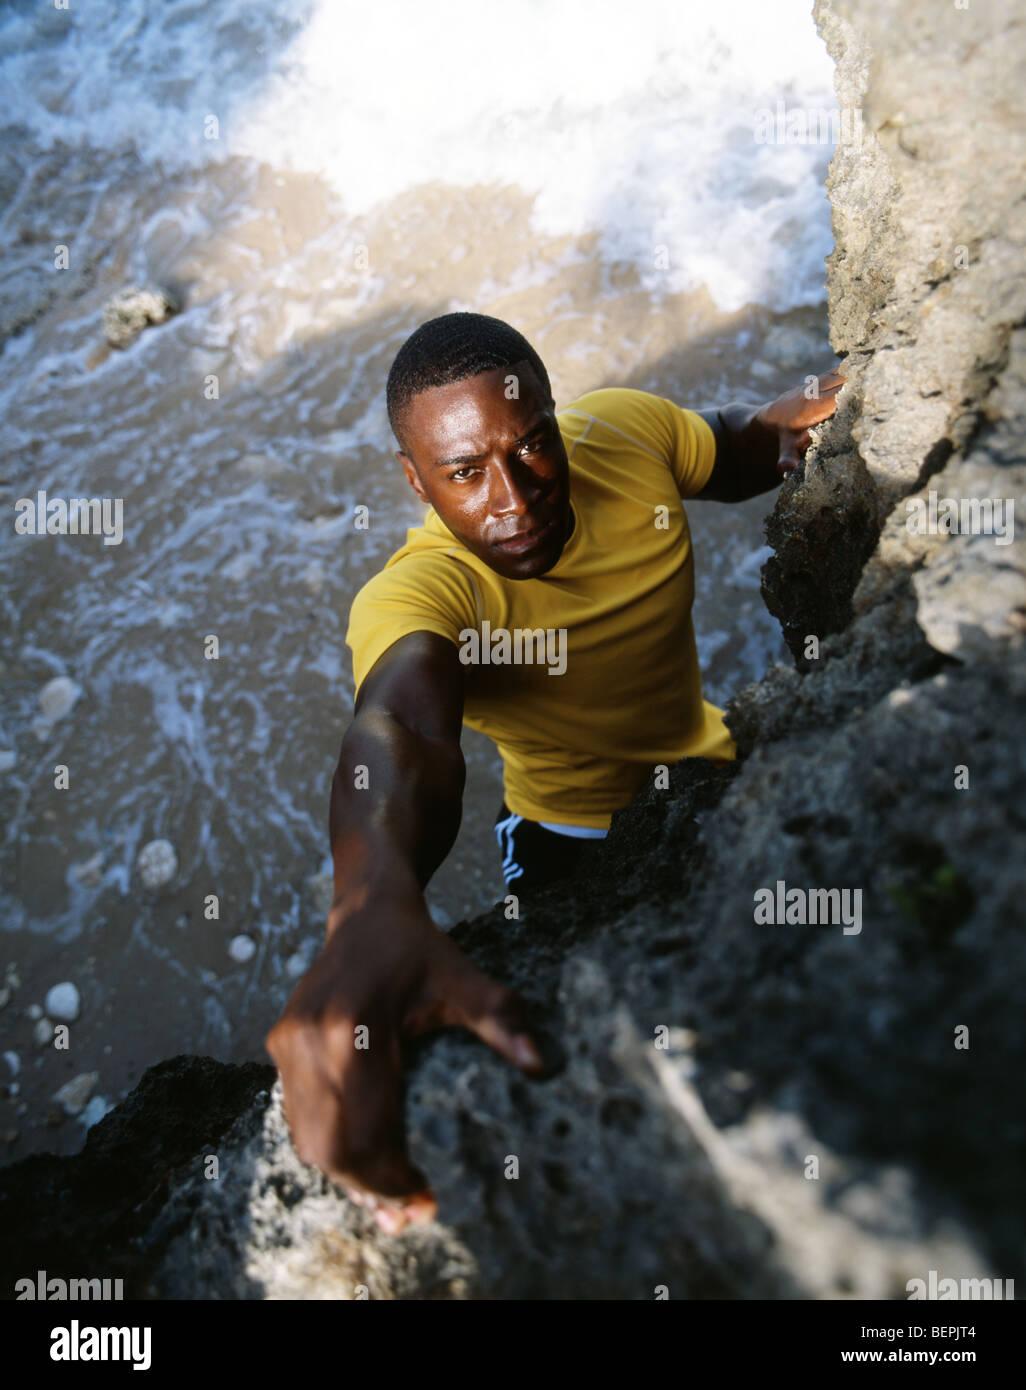 Rock climbing, Okinawa, Japan - Stock Image